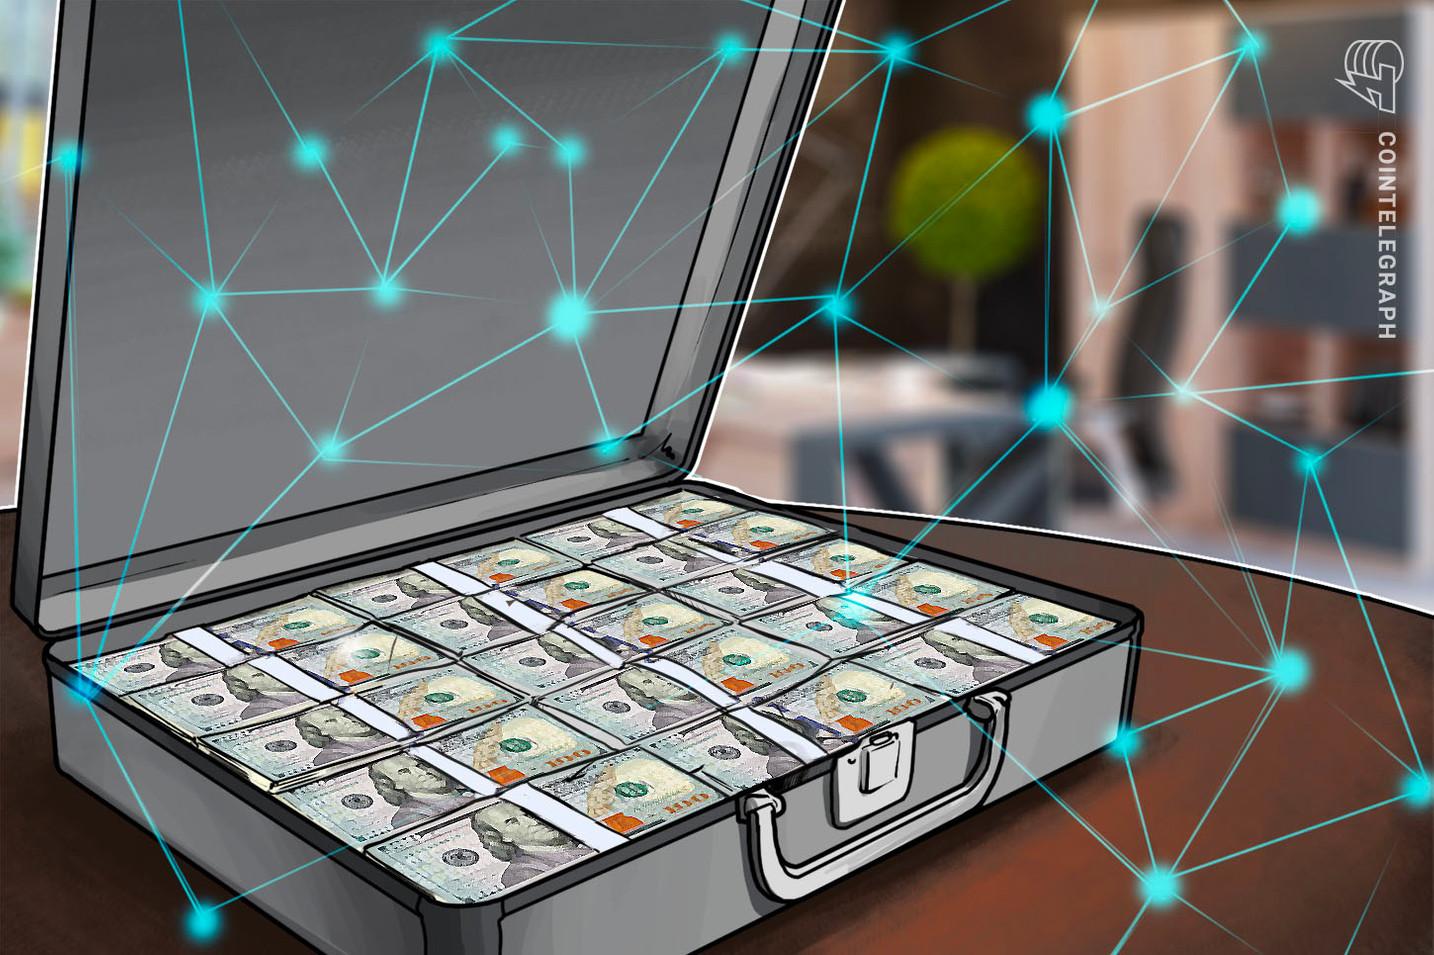 Enjin obtém financiamento de US$ 18,9 M para blockchain NFT baseada em Polkadot